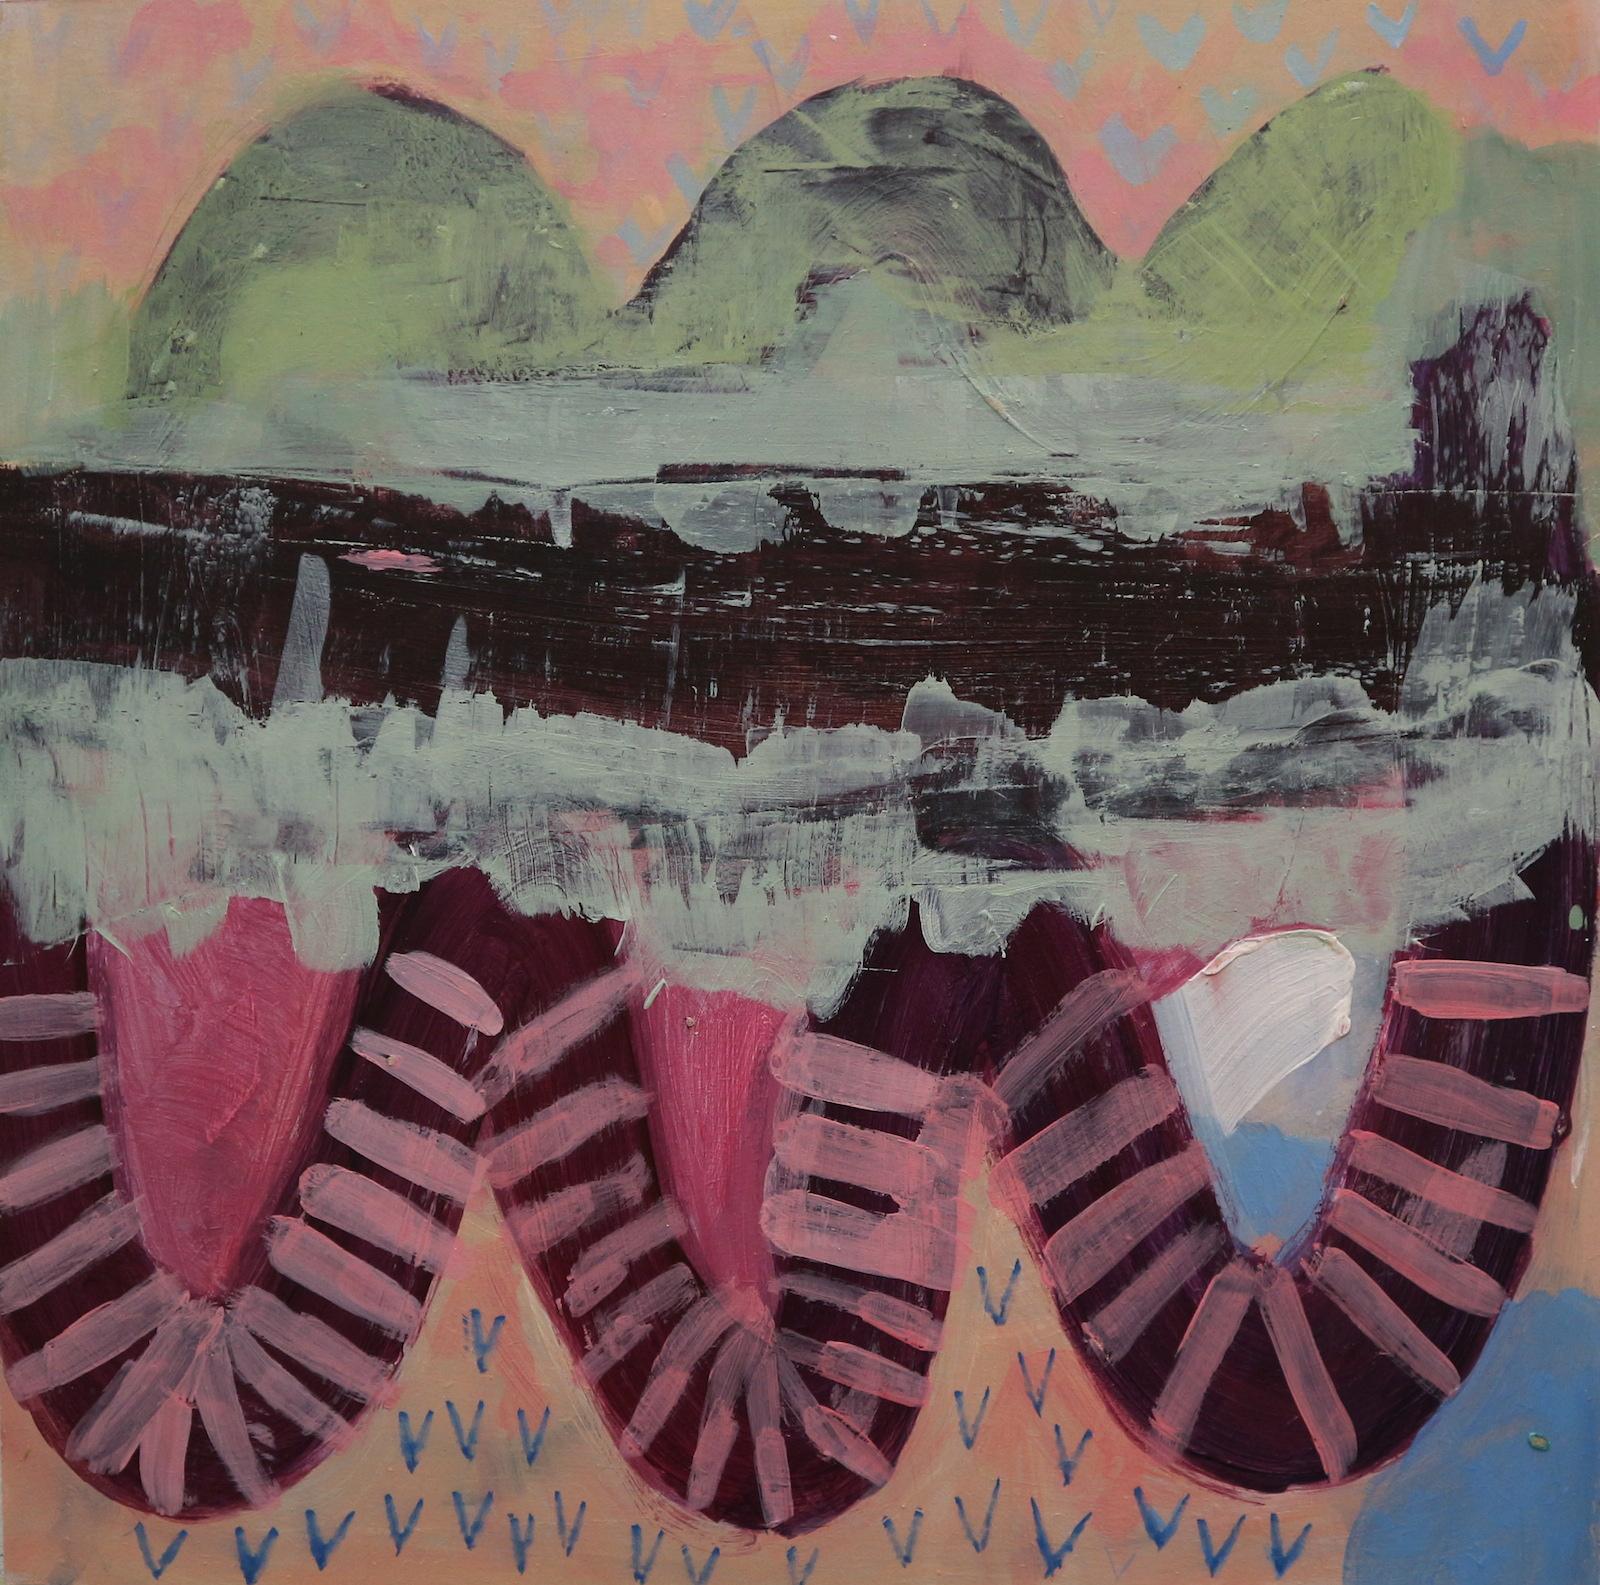 multicolored rivers, 40 cm x 40 cm, acrylic on mdf, 2016, Jane Hughes